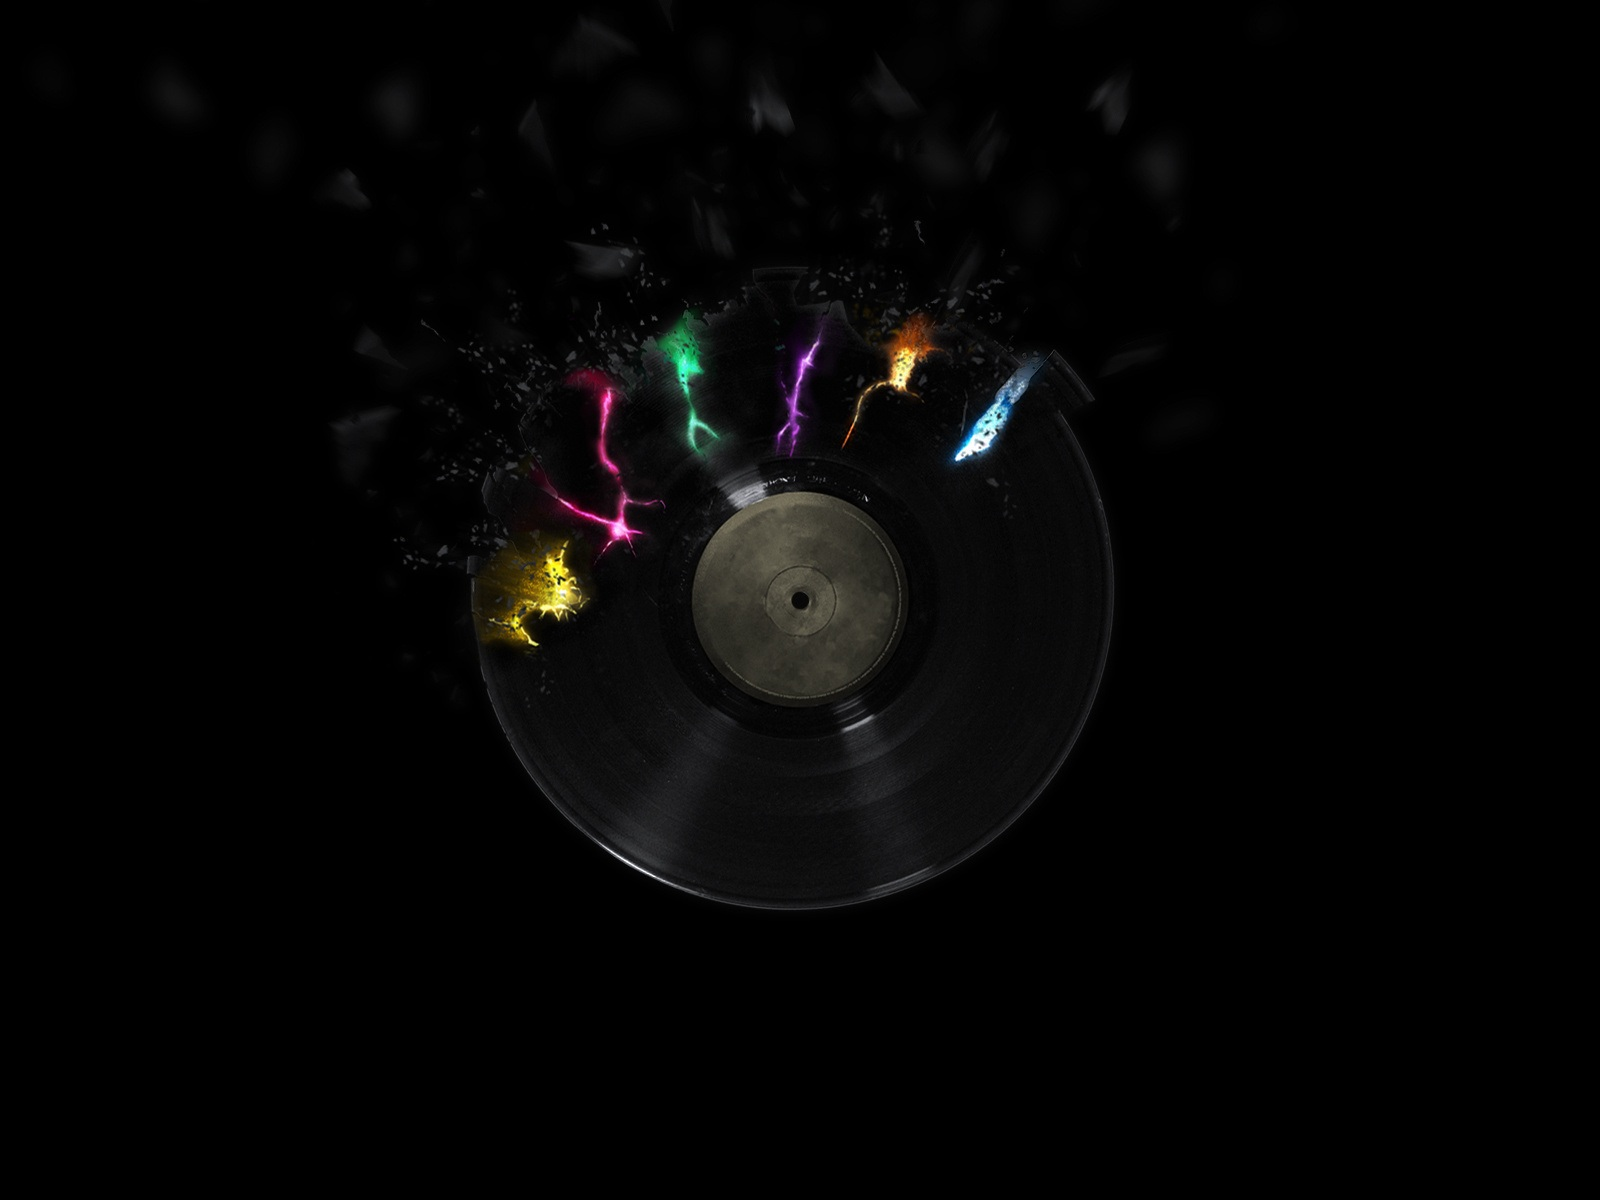 vinyl black music wallpaper pictselcom